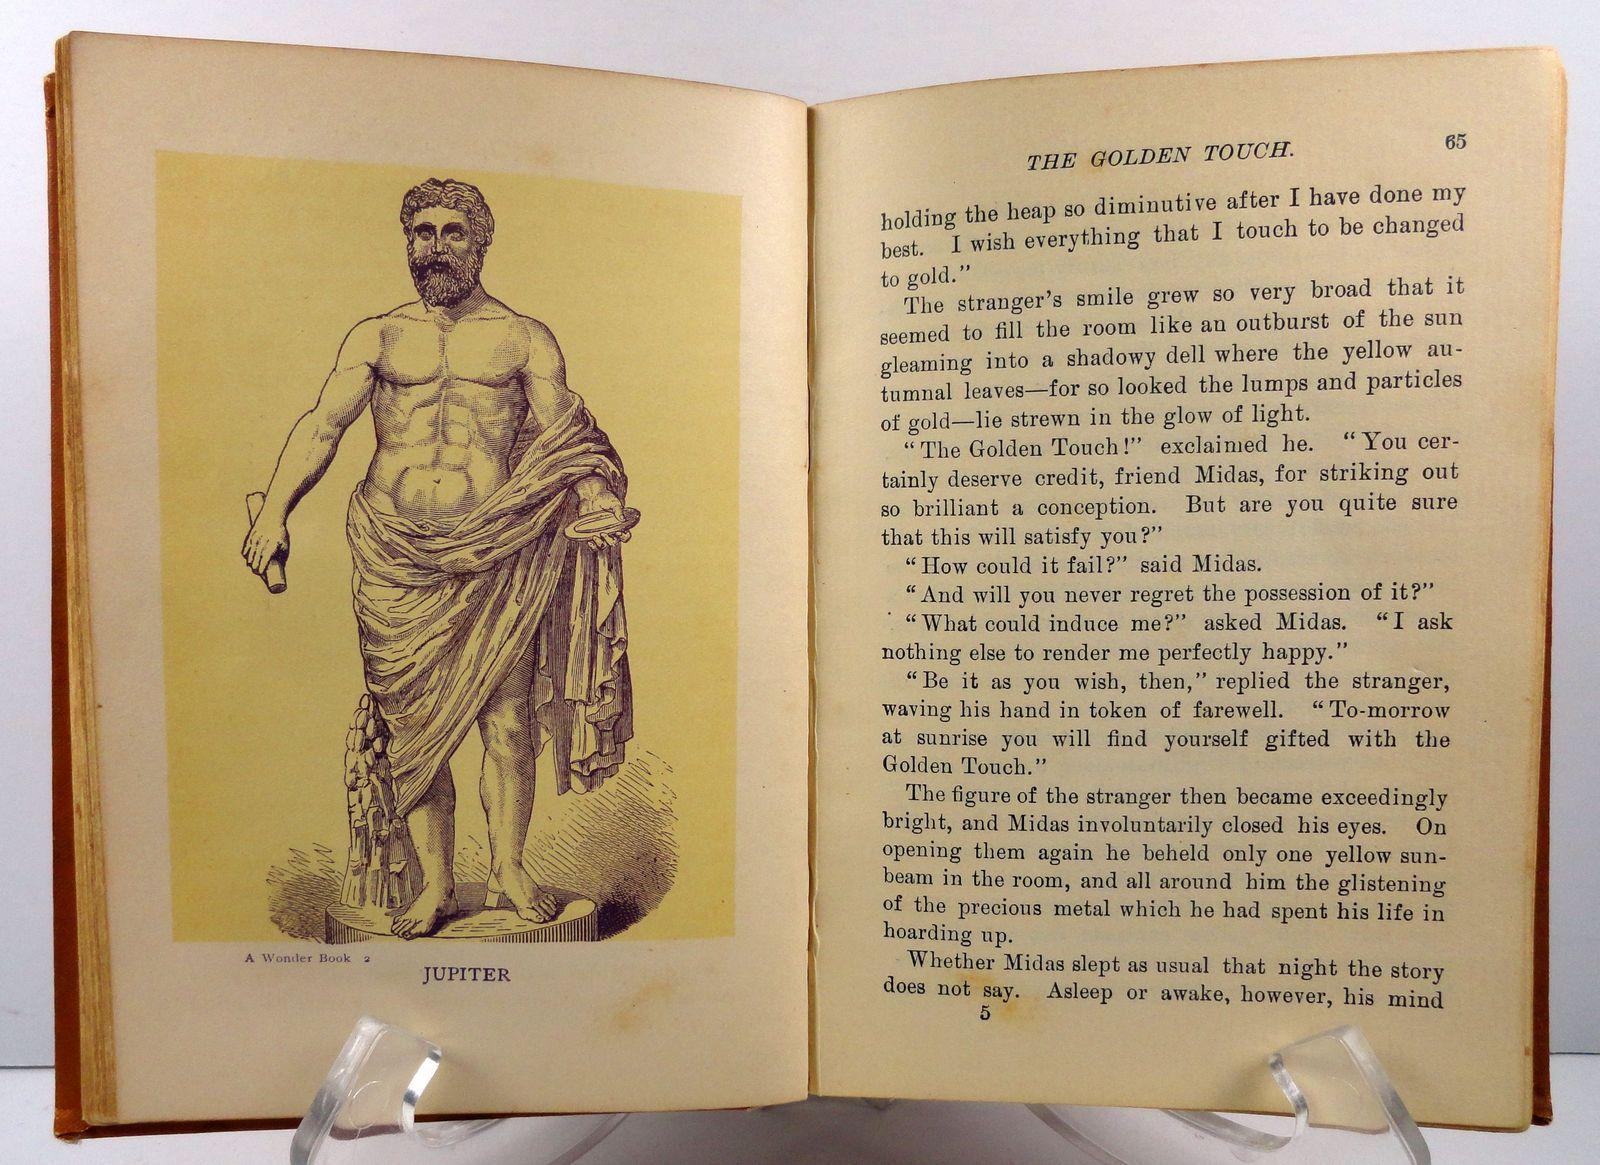 A Wonder Book by Nathaniel Hawthorne Henry Altemus